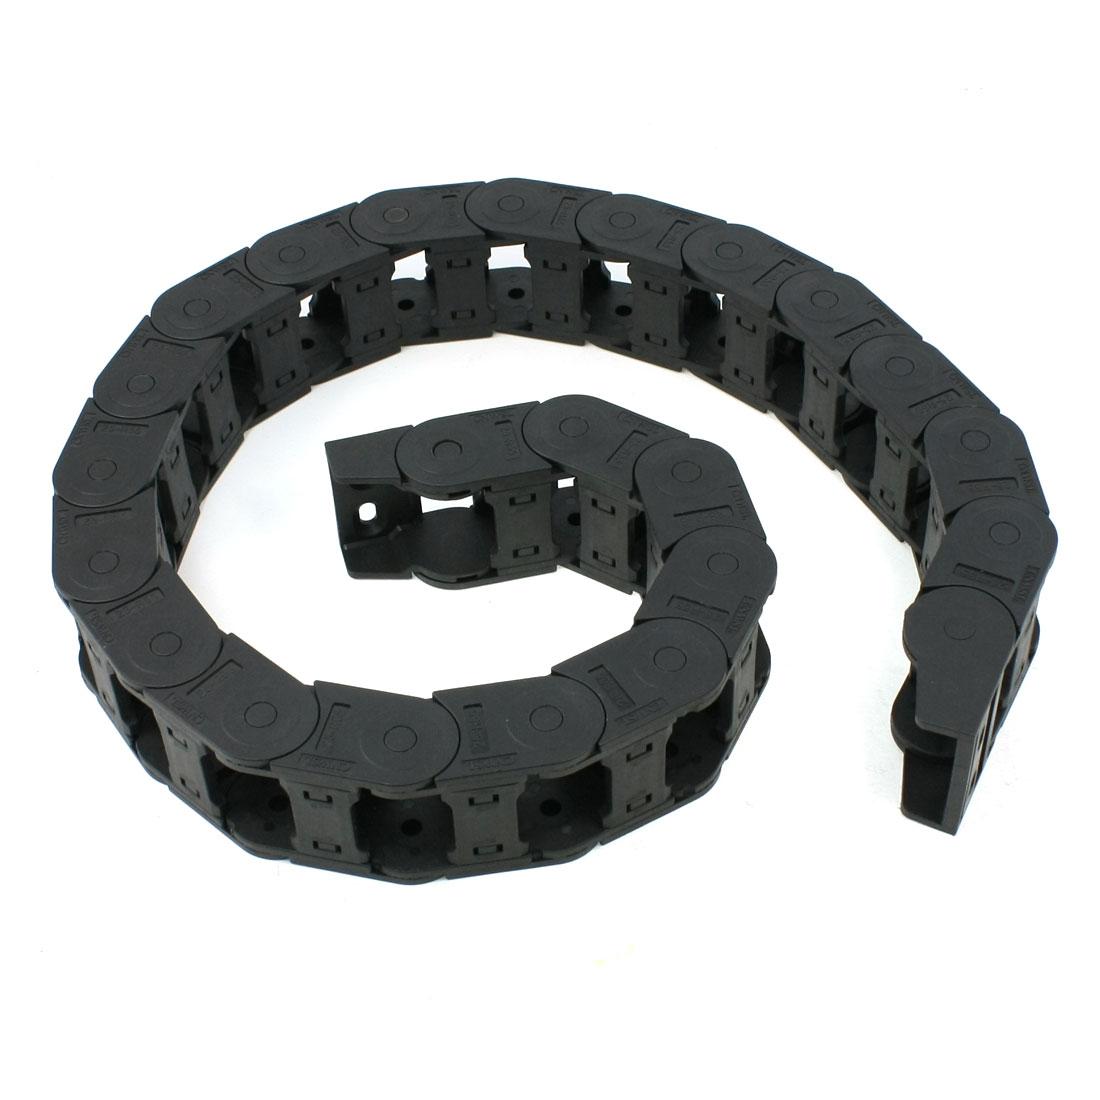 25mm x 38mm Flexible Semi Enclosed Towline Drag Chain Carrier 100cm